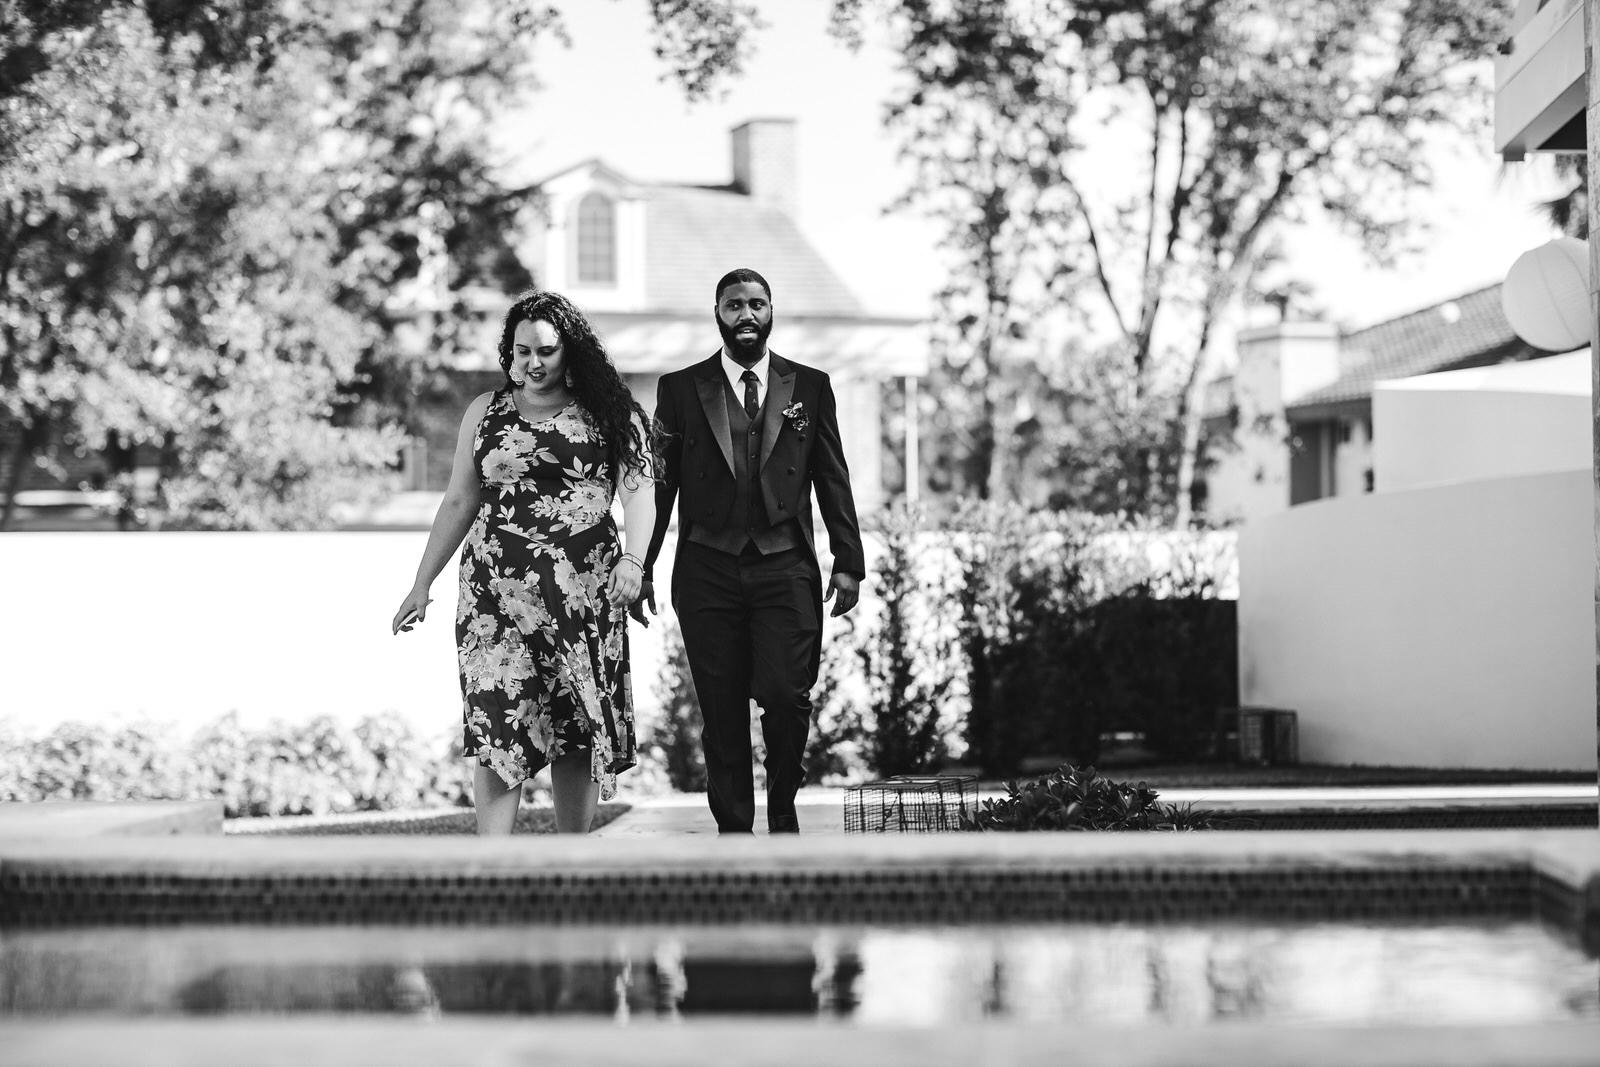 ceremony-walk-backyard-wedding-black-and-white-photography.jpg